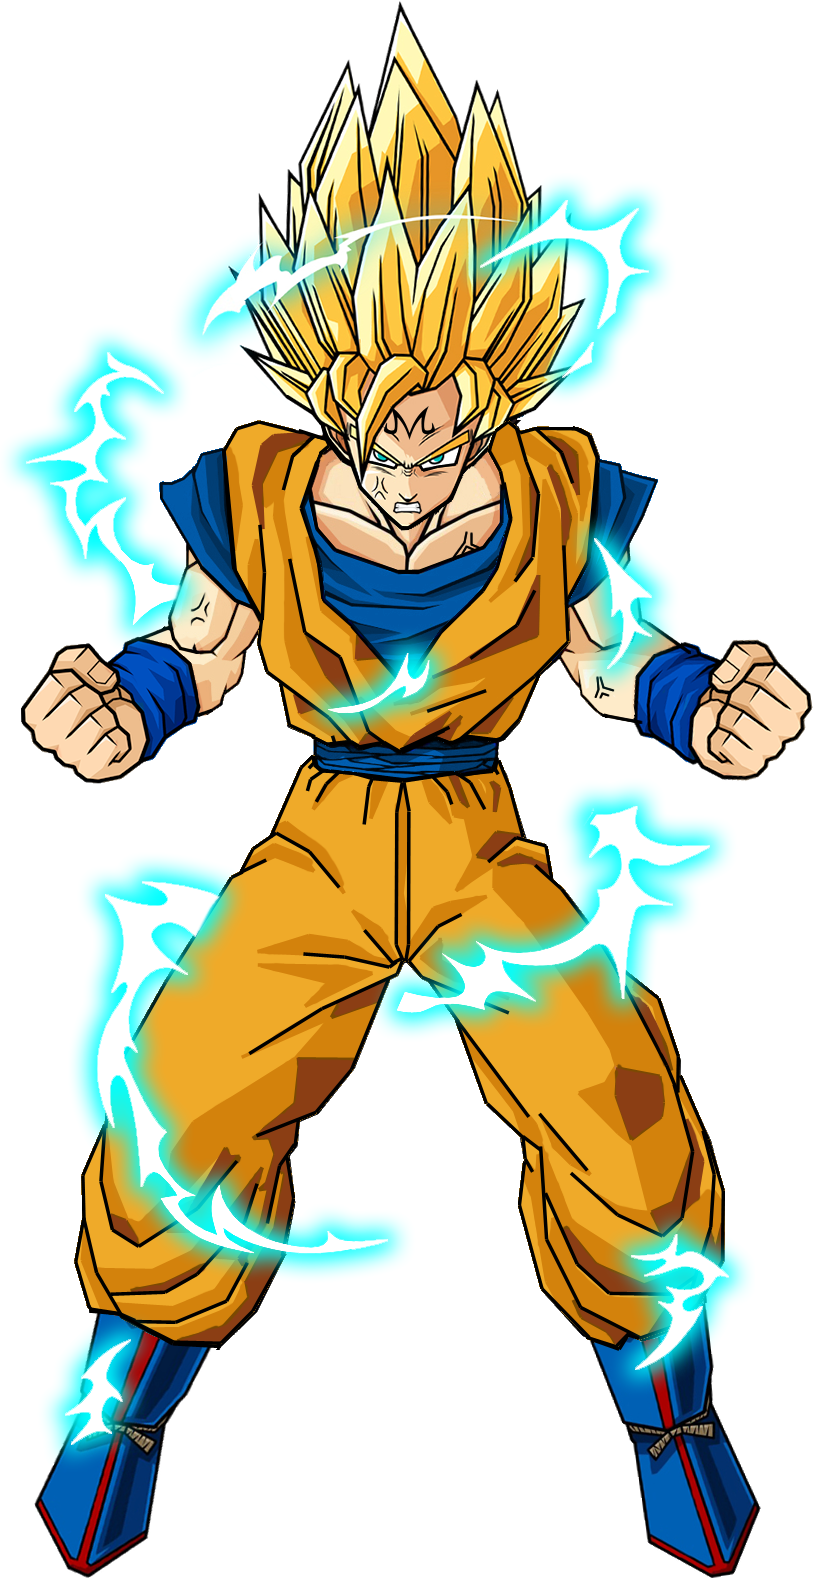 Majin goku | Dragon Ball Fan Fiction Multiverse Wiki ...